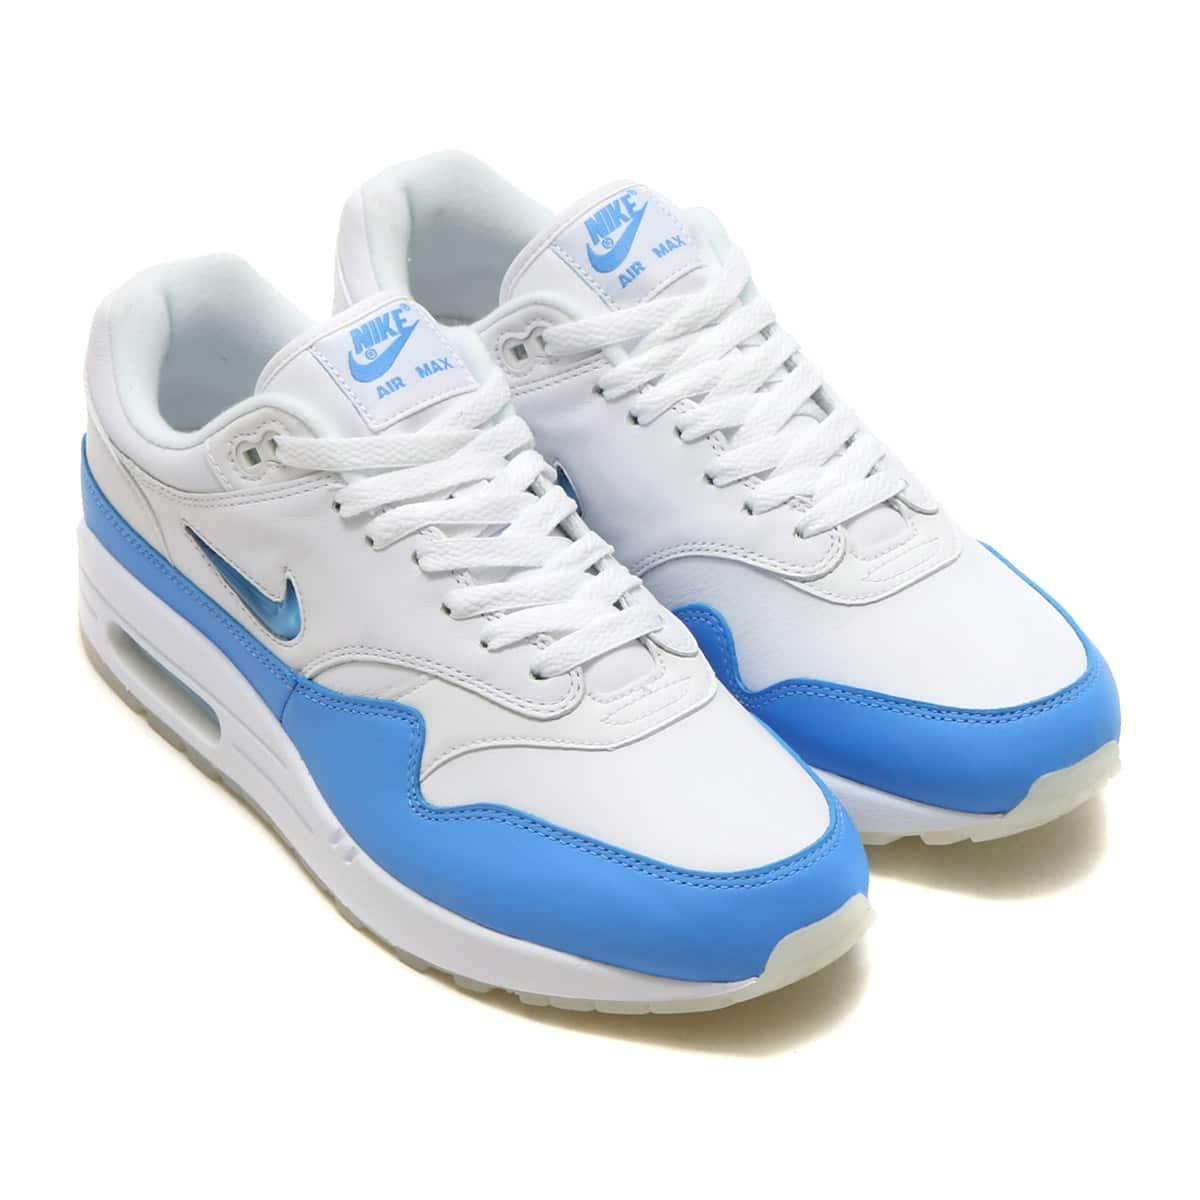 NIKE AIR MAX 1 PREMIUM SC  WHITE/UNIVERSITY BLUE-UNIVERSITY BLUE_photo_large